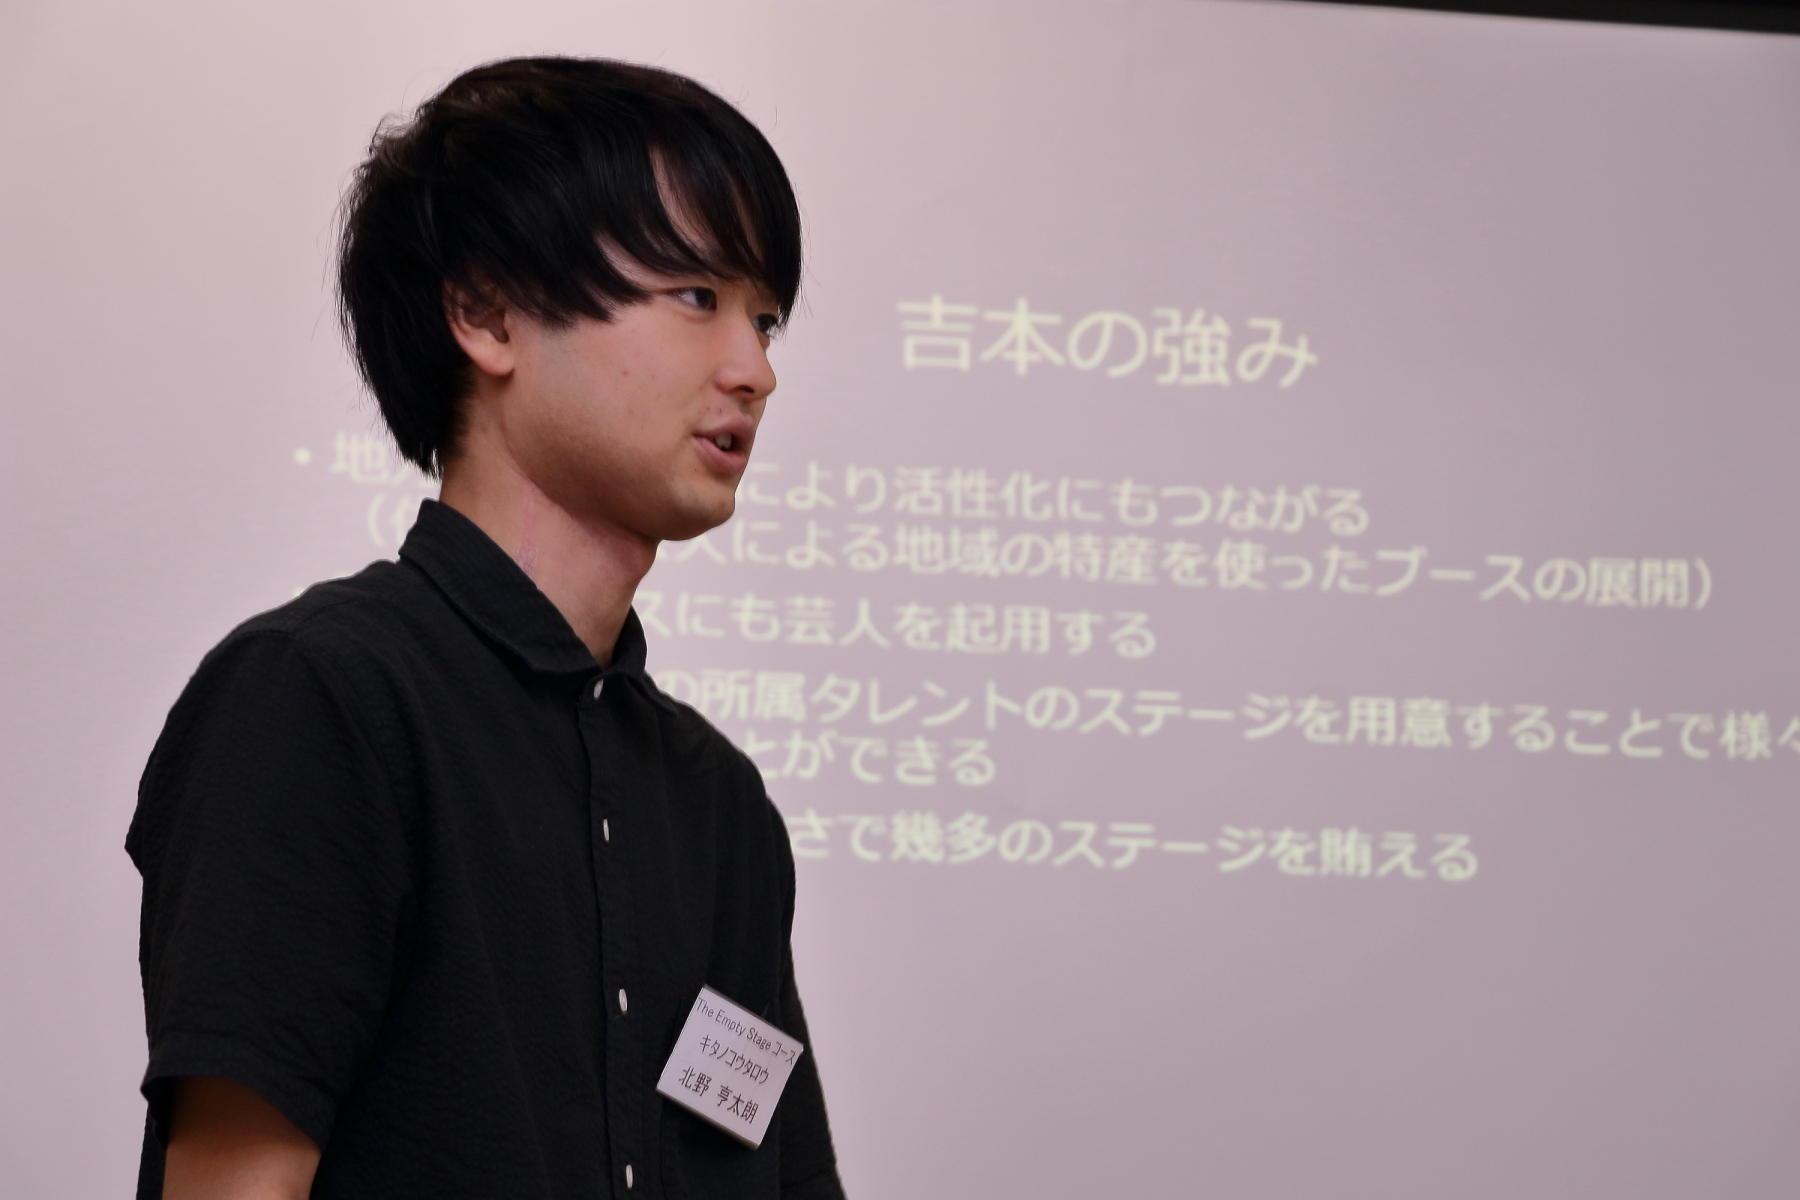 http://news.yoshimoto.co.jp/20170910063410-6206ba4558001f47f39287ccc8a612721e0a0b4d.jpg